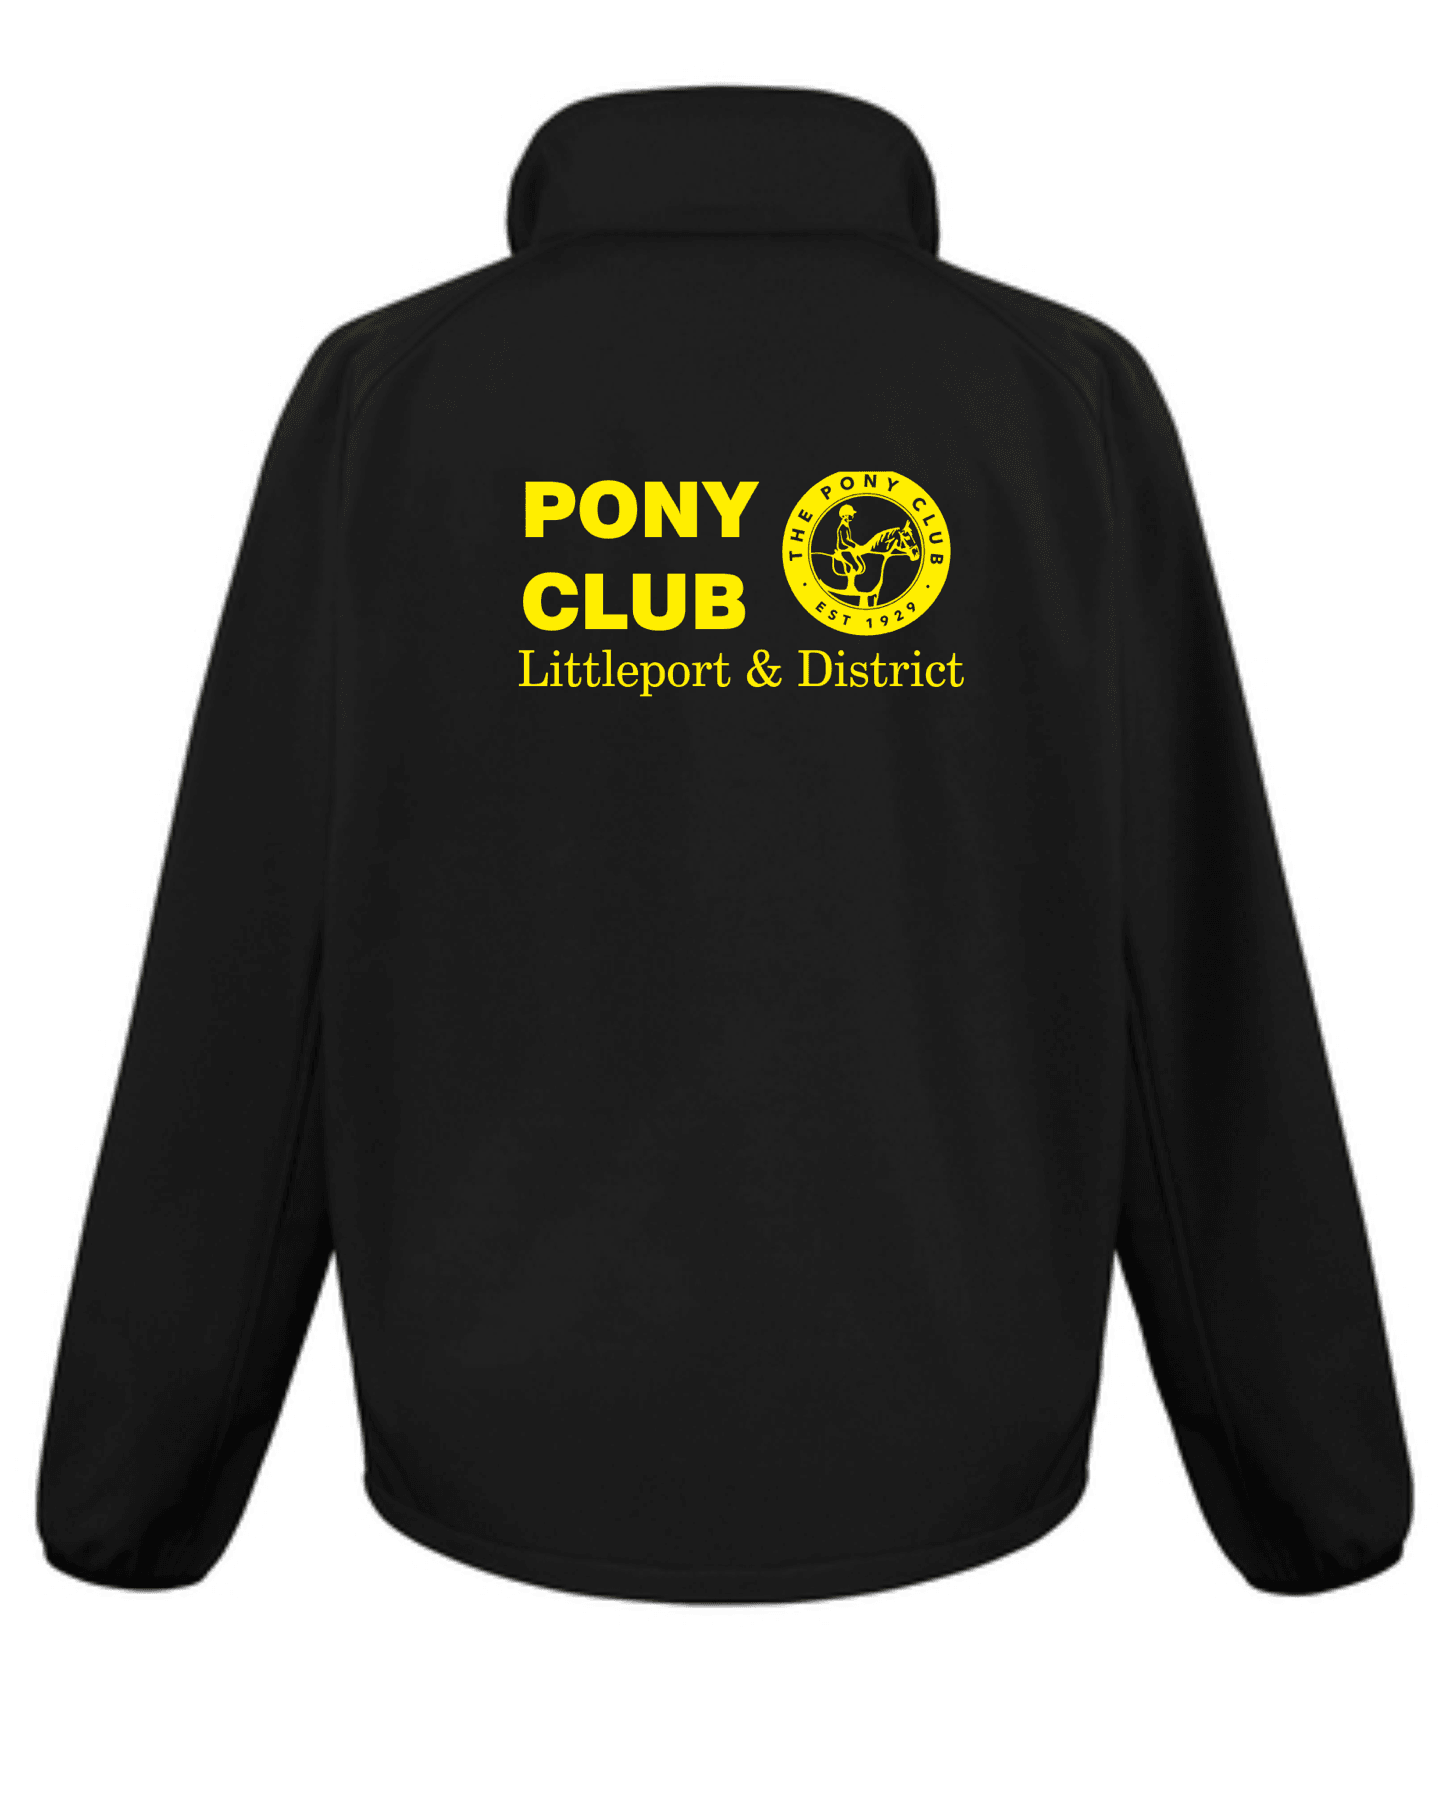 Littleport & District Pony Club – Softshell Kids